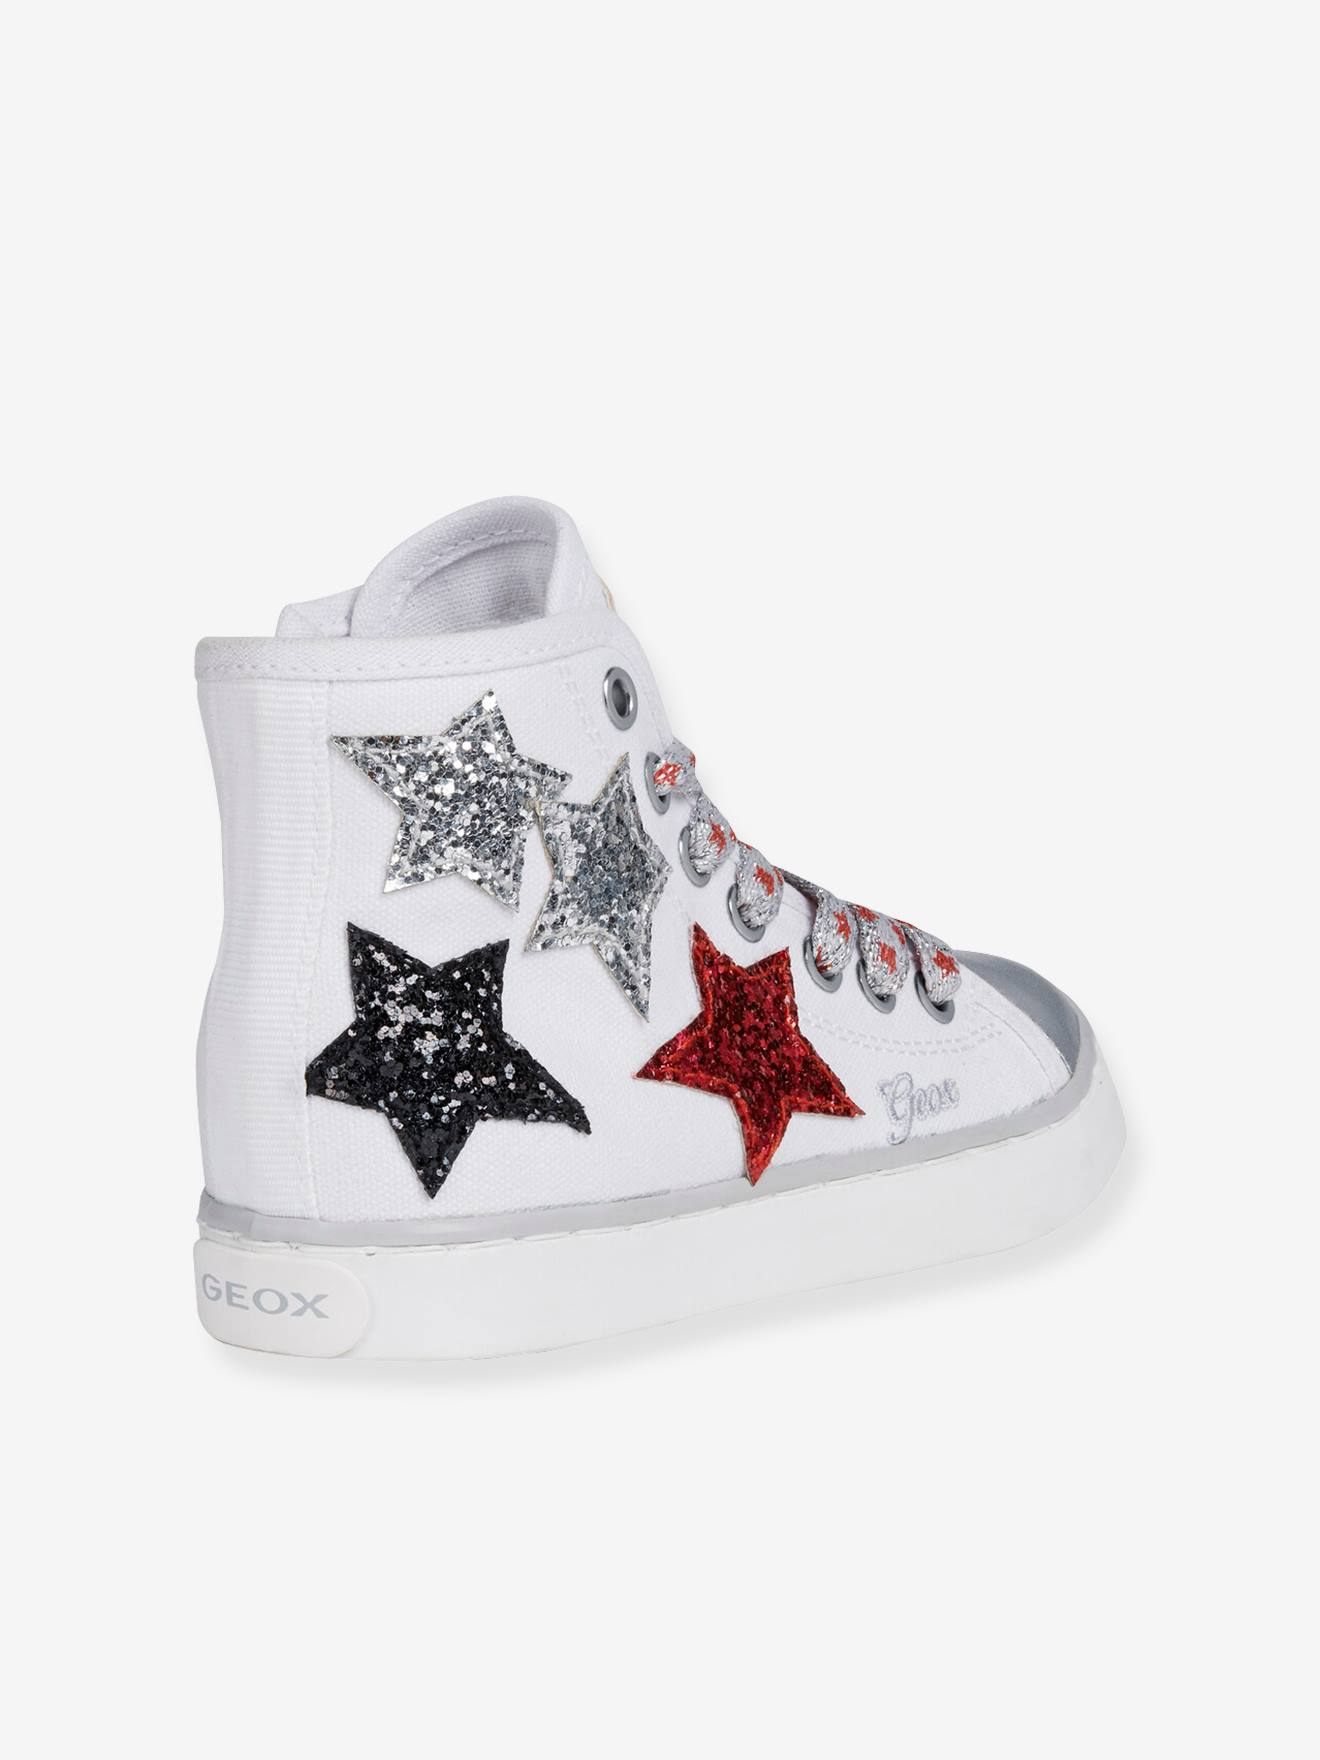 "Geox Mädchen Sneakers ""Ciak"" GEOX in weiß"